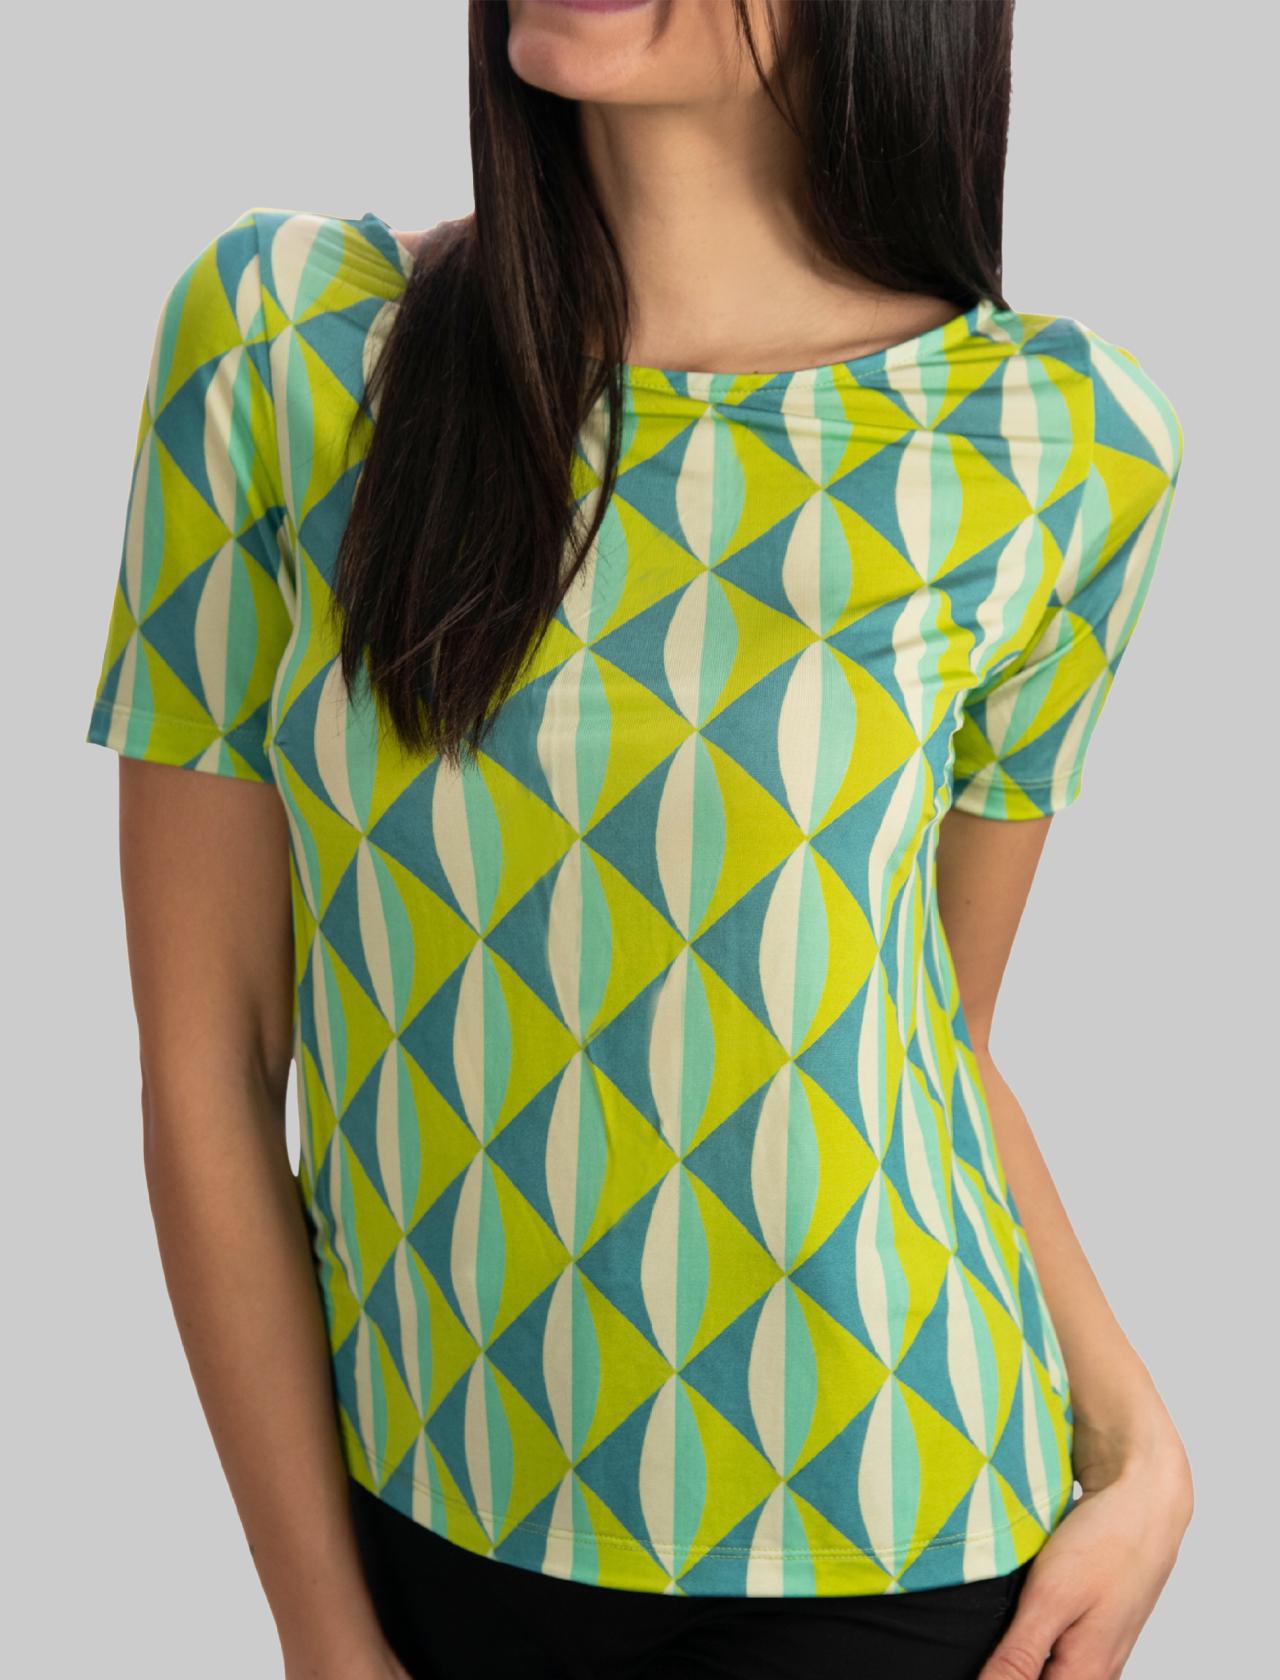 Women's Clothing Jersey T-shirt Symmetria Boat Neckline Aqua Green Fantasy Maliparmi | T-shirts and Tops | JK018370496A8208